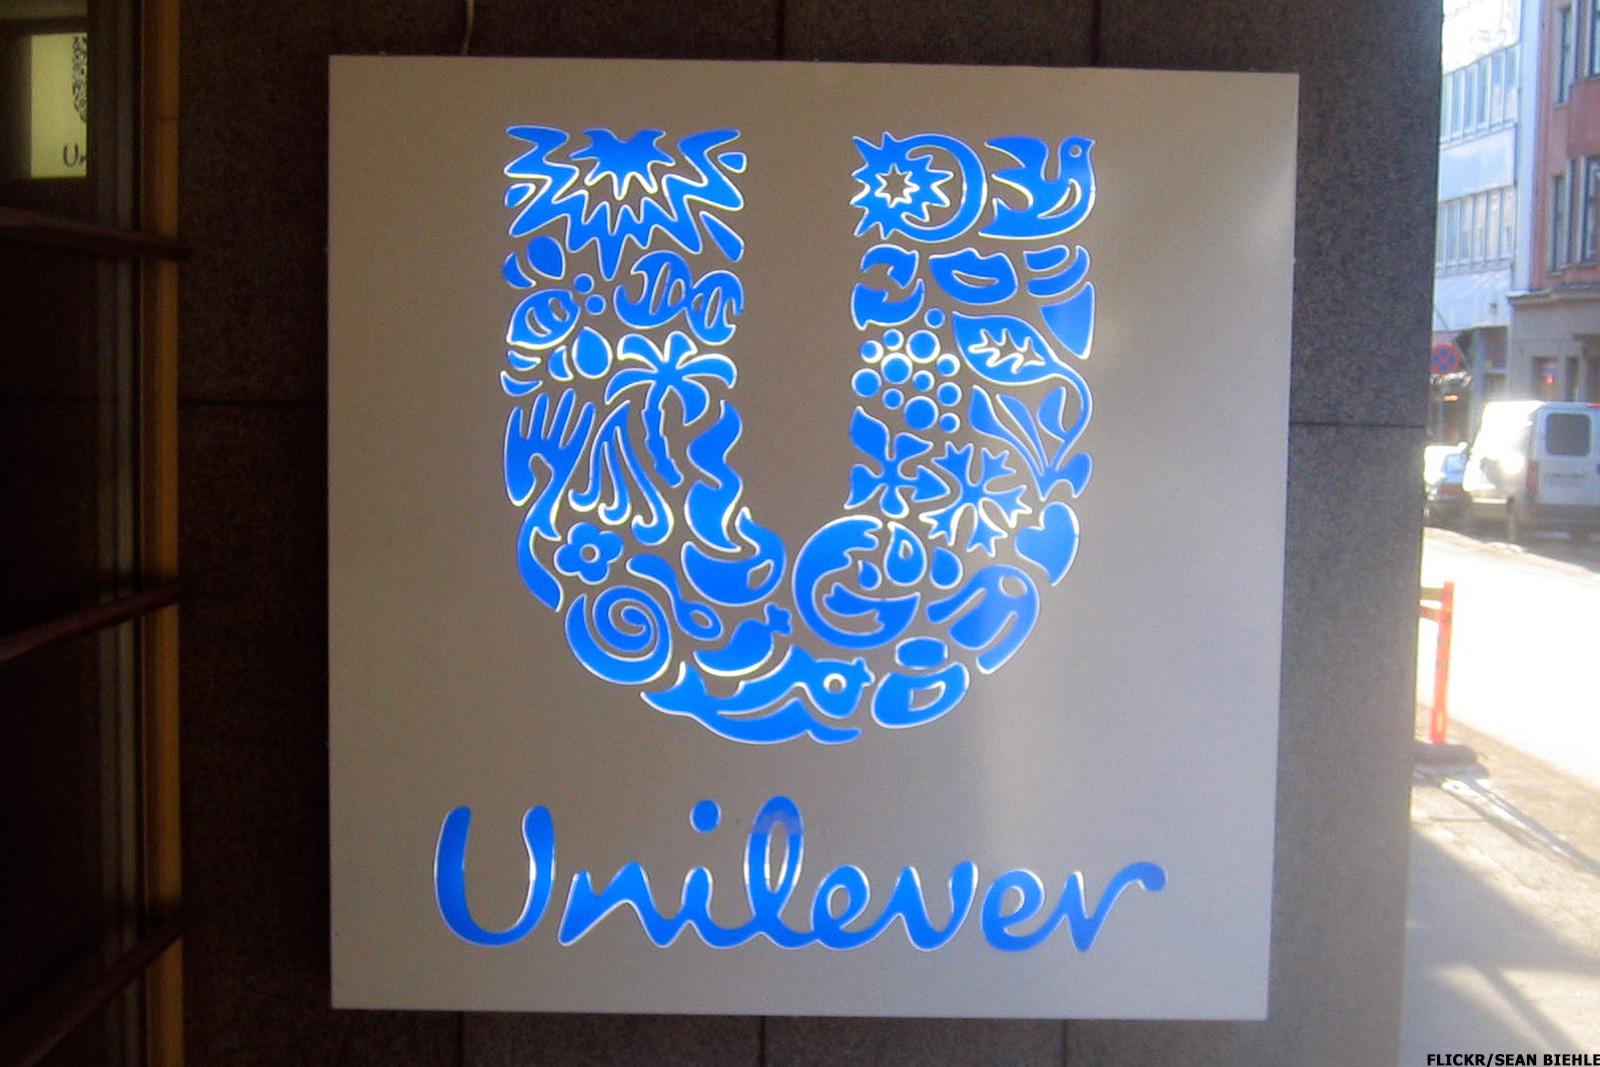 limitation of study for unilever nigeria plc Unilever nigeria address nf the official address of unilever nigeria plc is top 100 best secondary schools in nigeria best polytechnics to study.